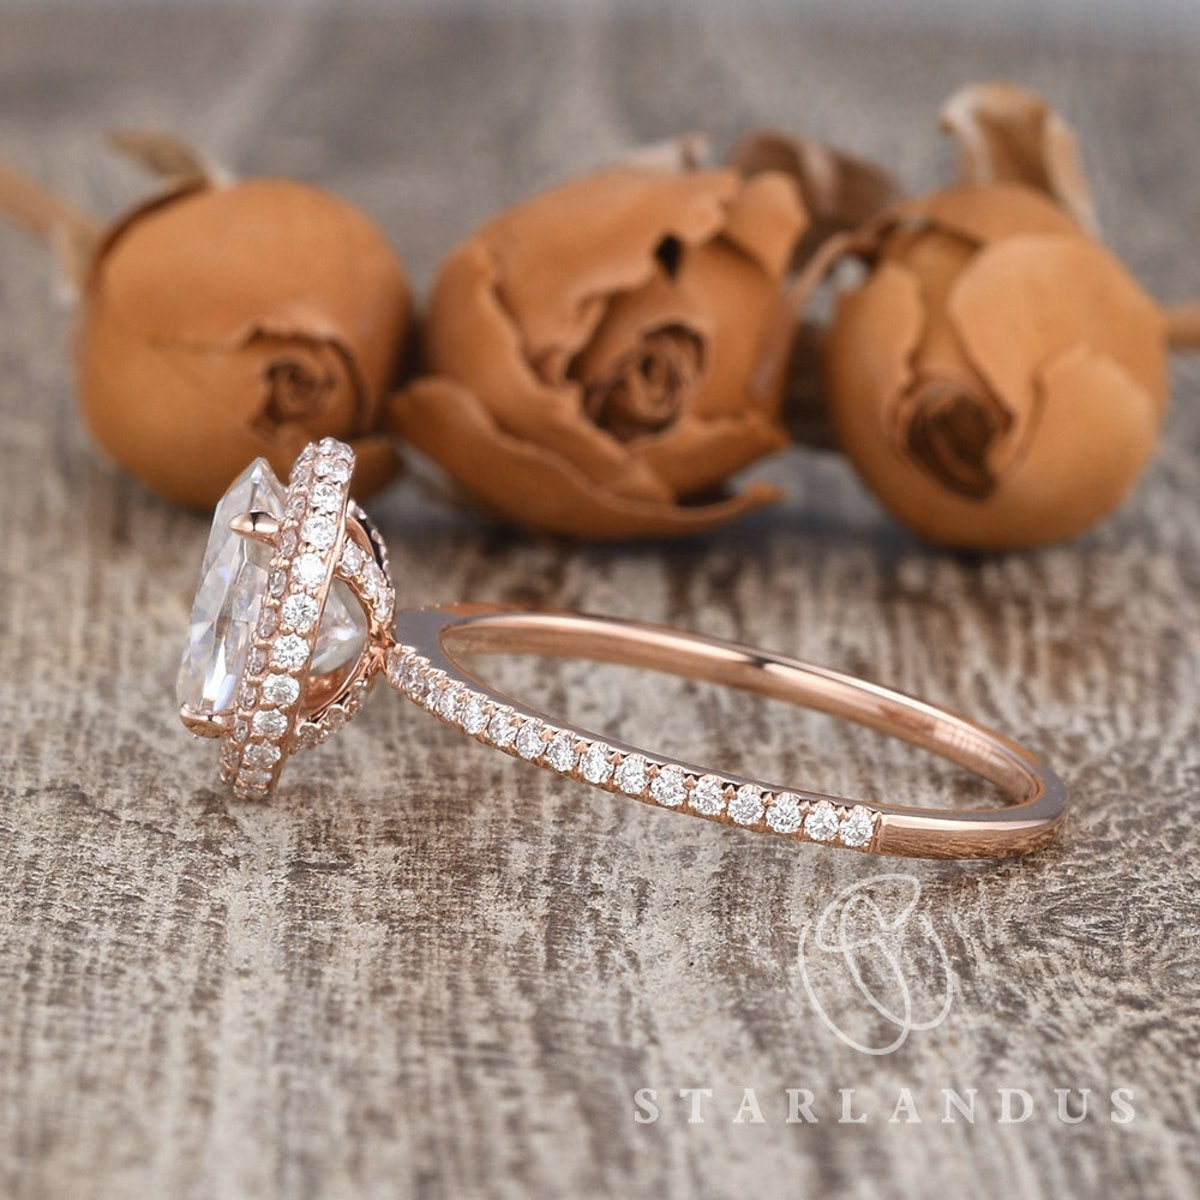 2ct Moissanite Ring Oval Cut Engagement Ring Rose Gold Wedding Ring Hidden Halo Moissanite Halo Enga...